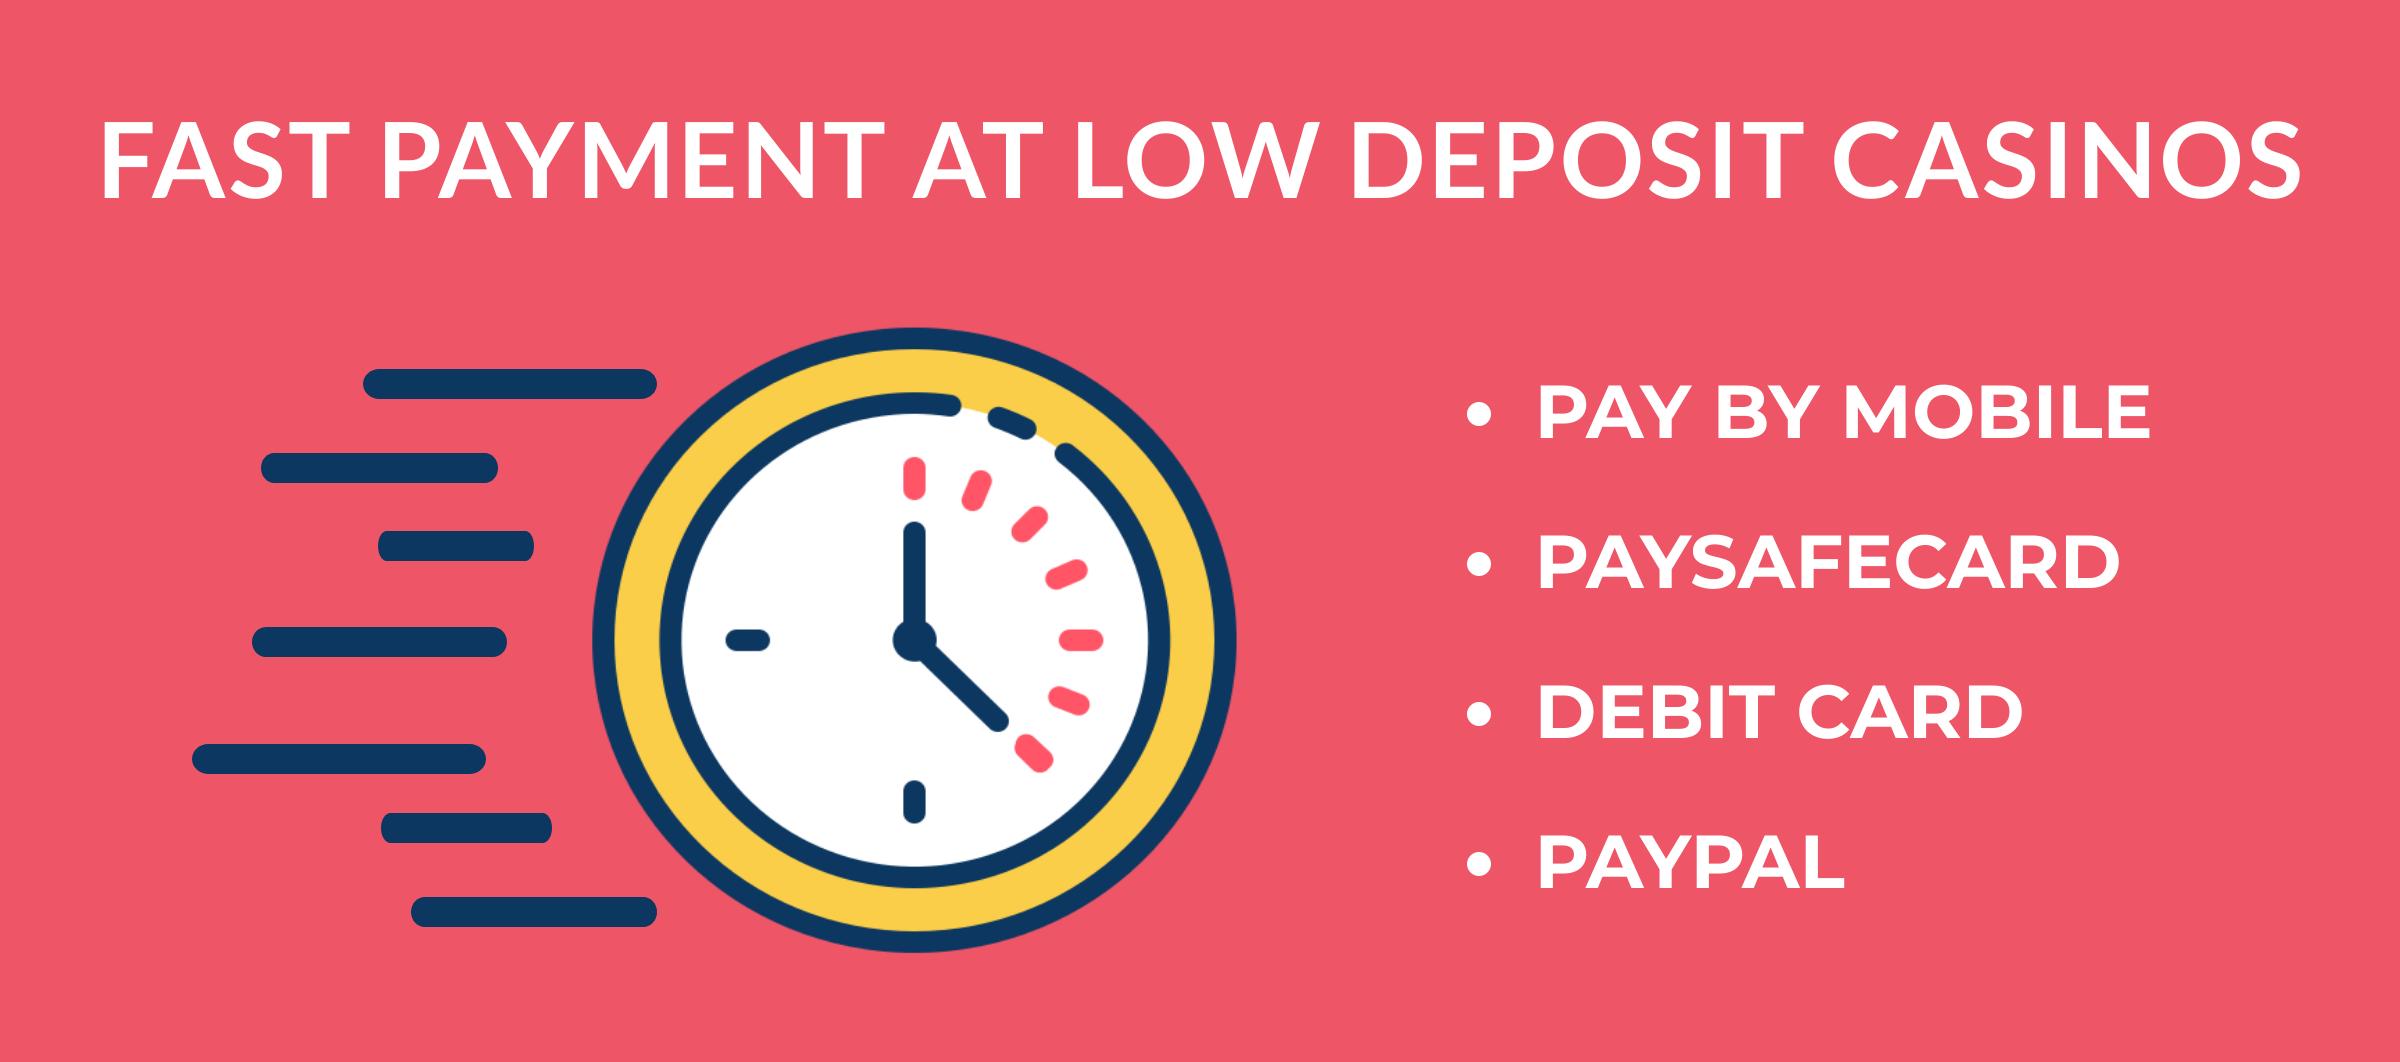 fast payment methods at low deposit casinos